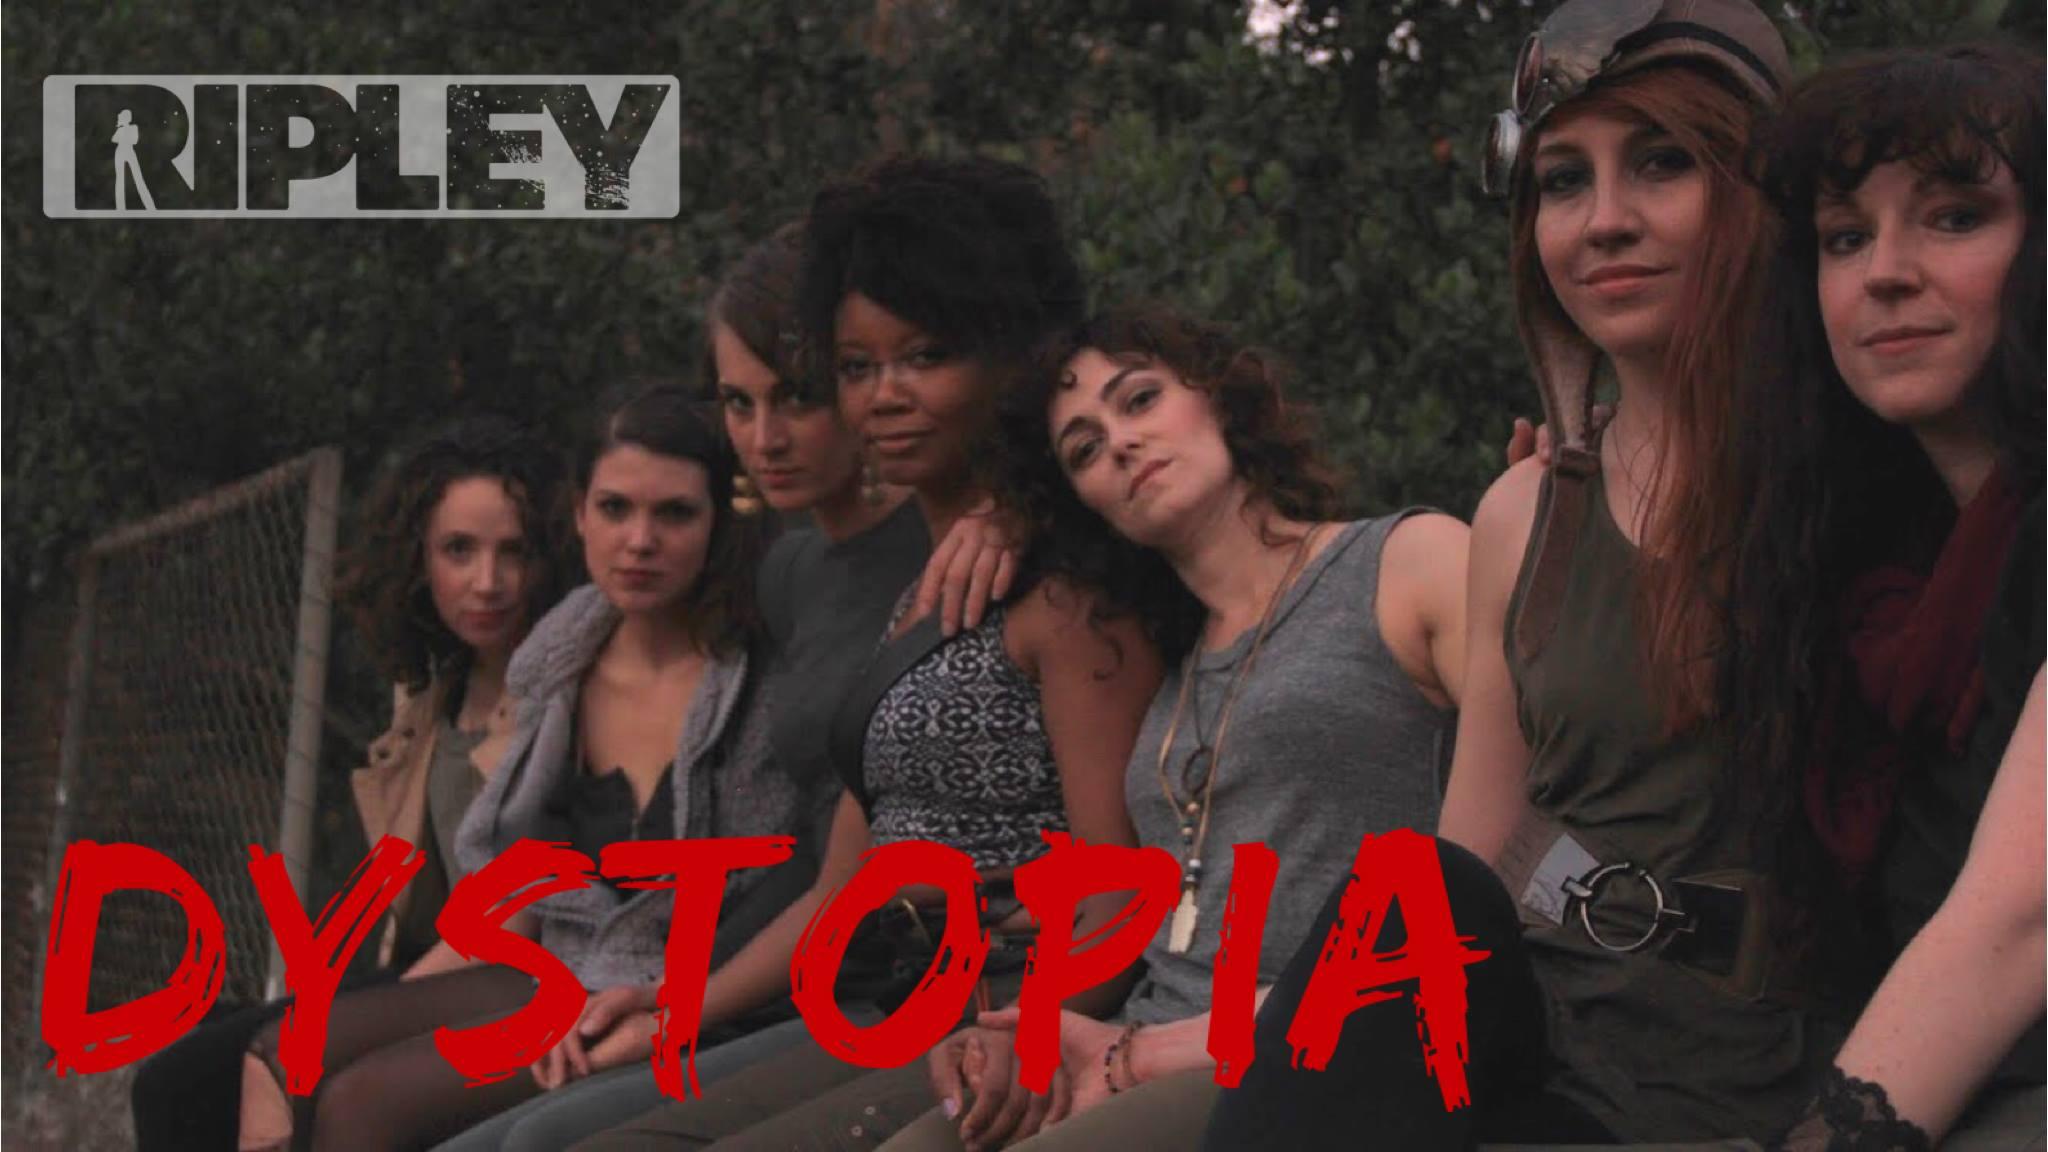 Ripley - Dystopia.jpg